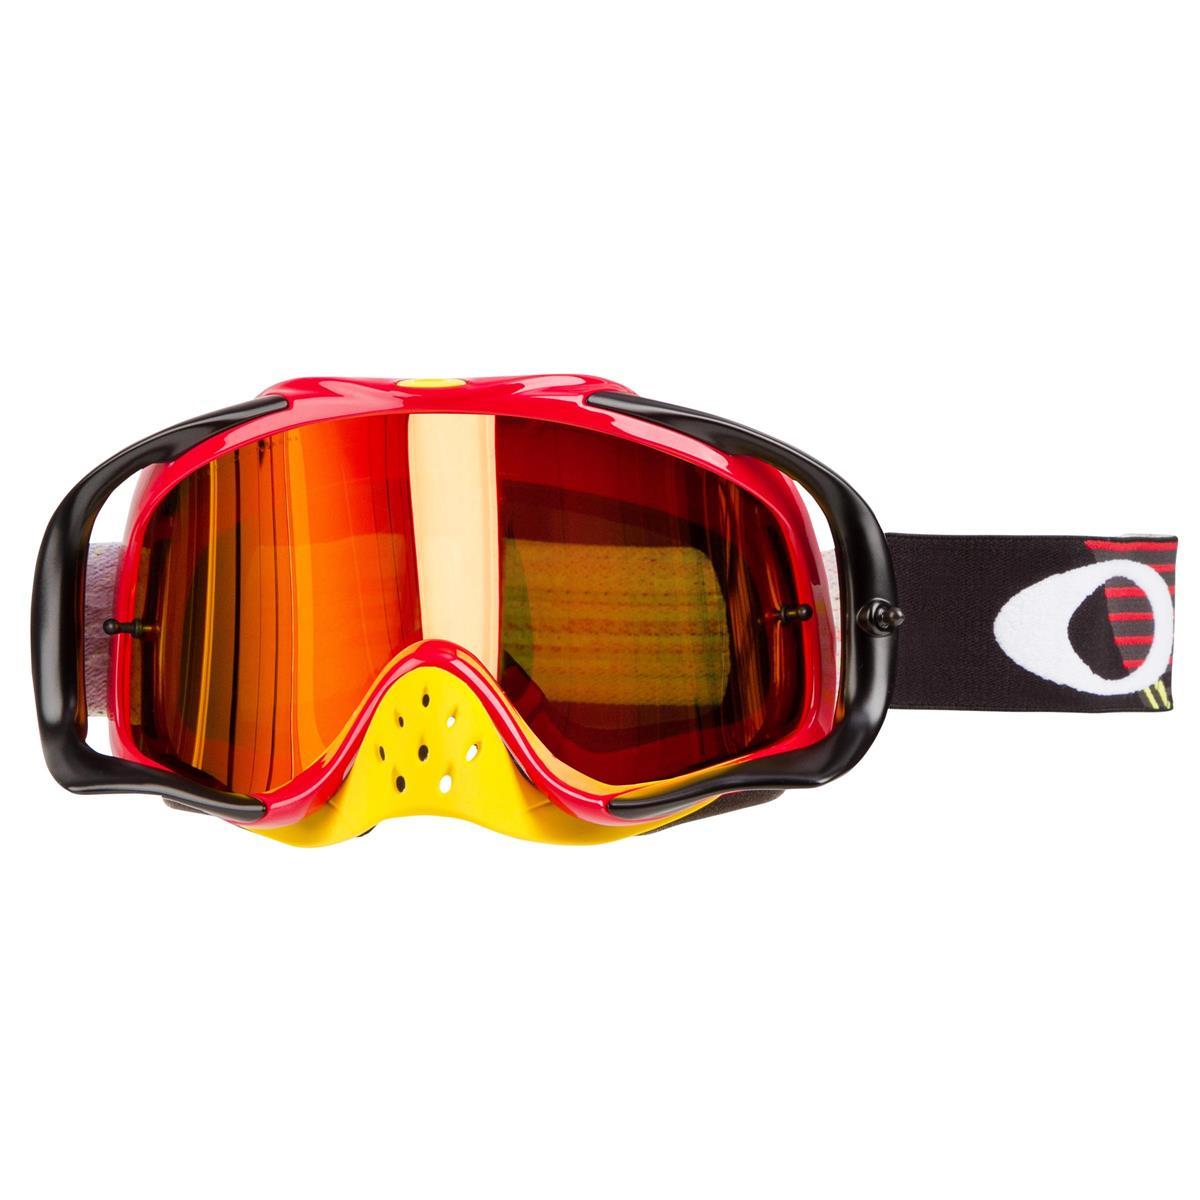 d3513e619c Oakley MX Goggle Crowbar MX Circuit Red Yellow - Fire Iridium 2019 ...